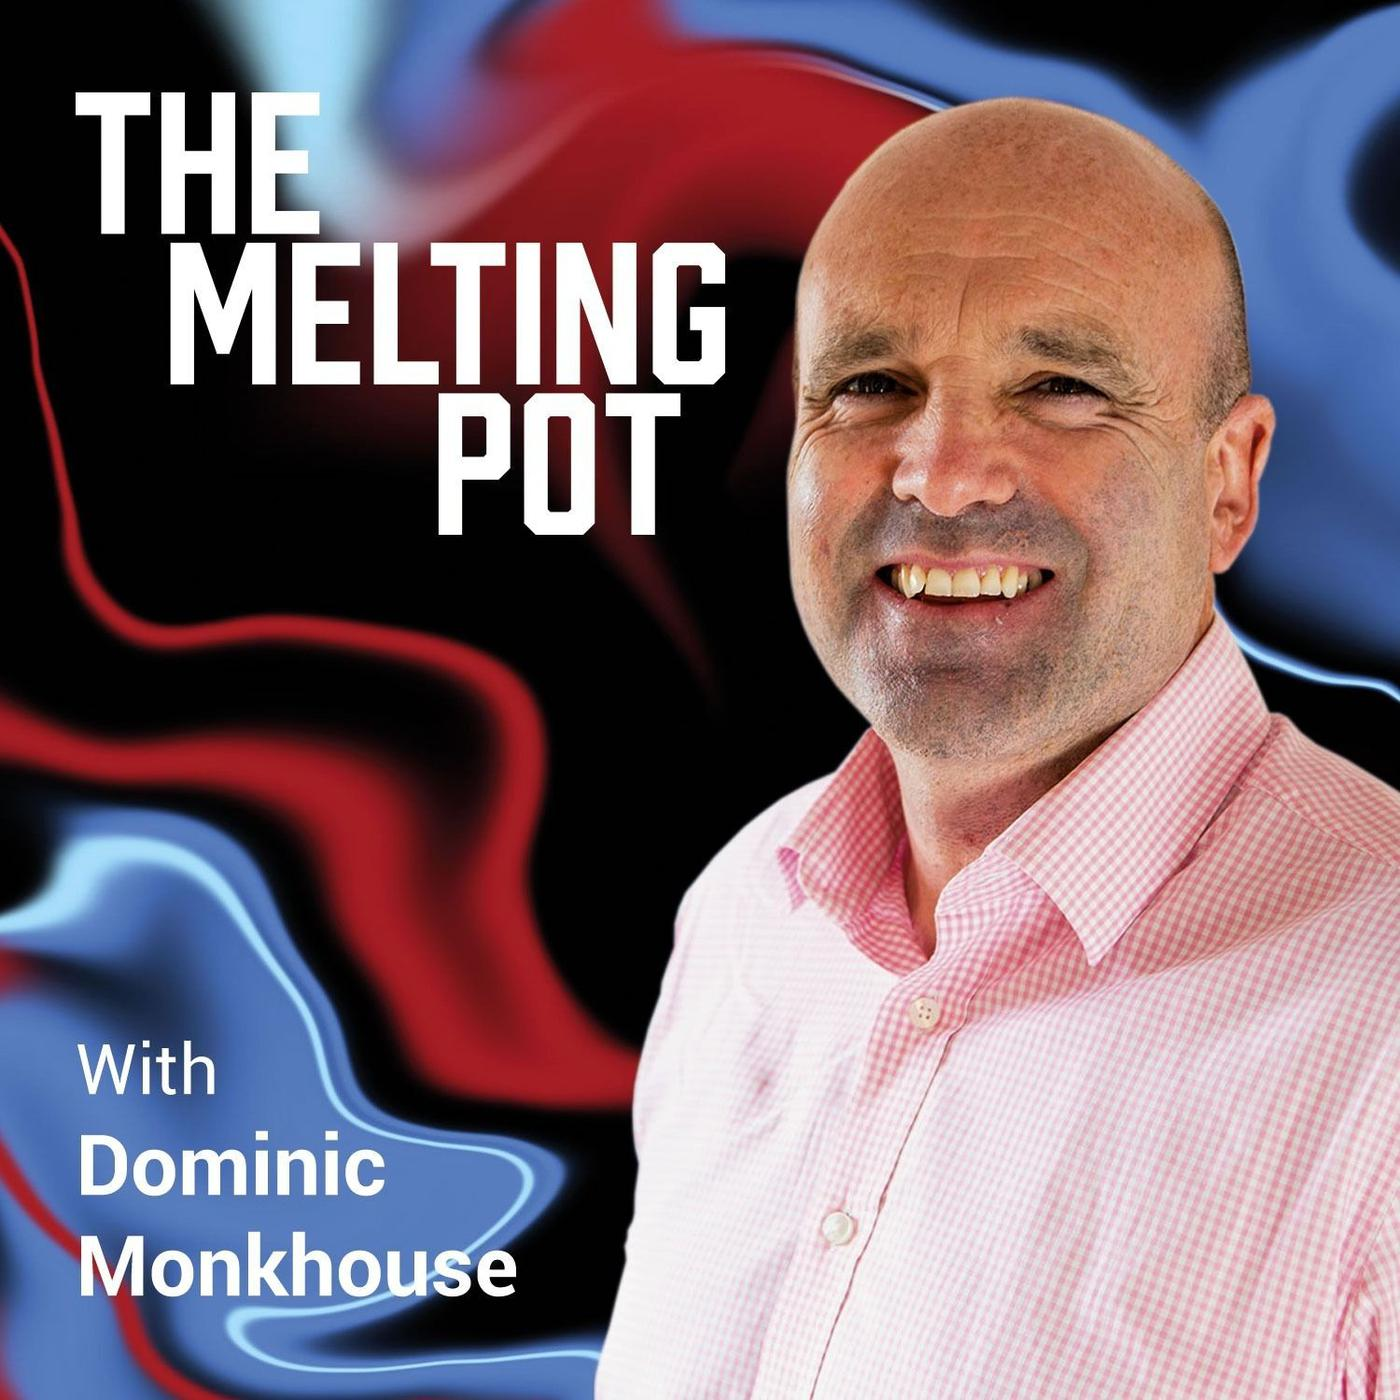 Dominic Monkhouse